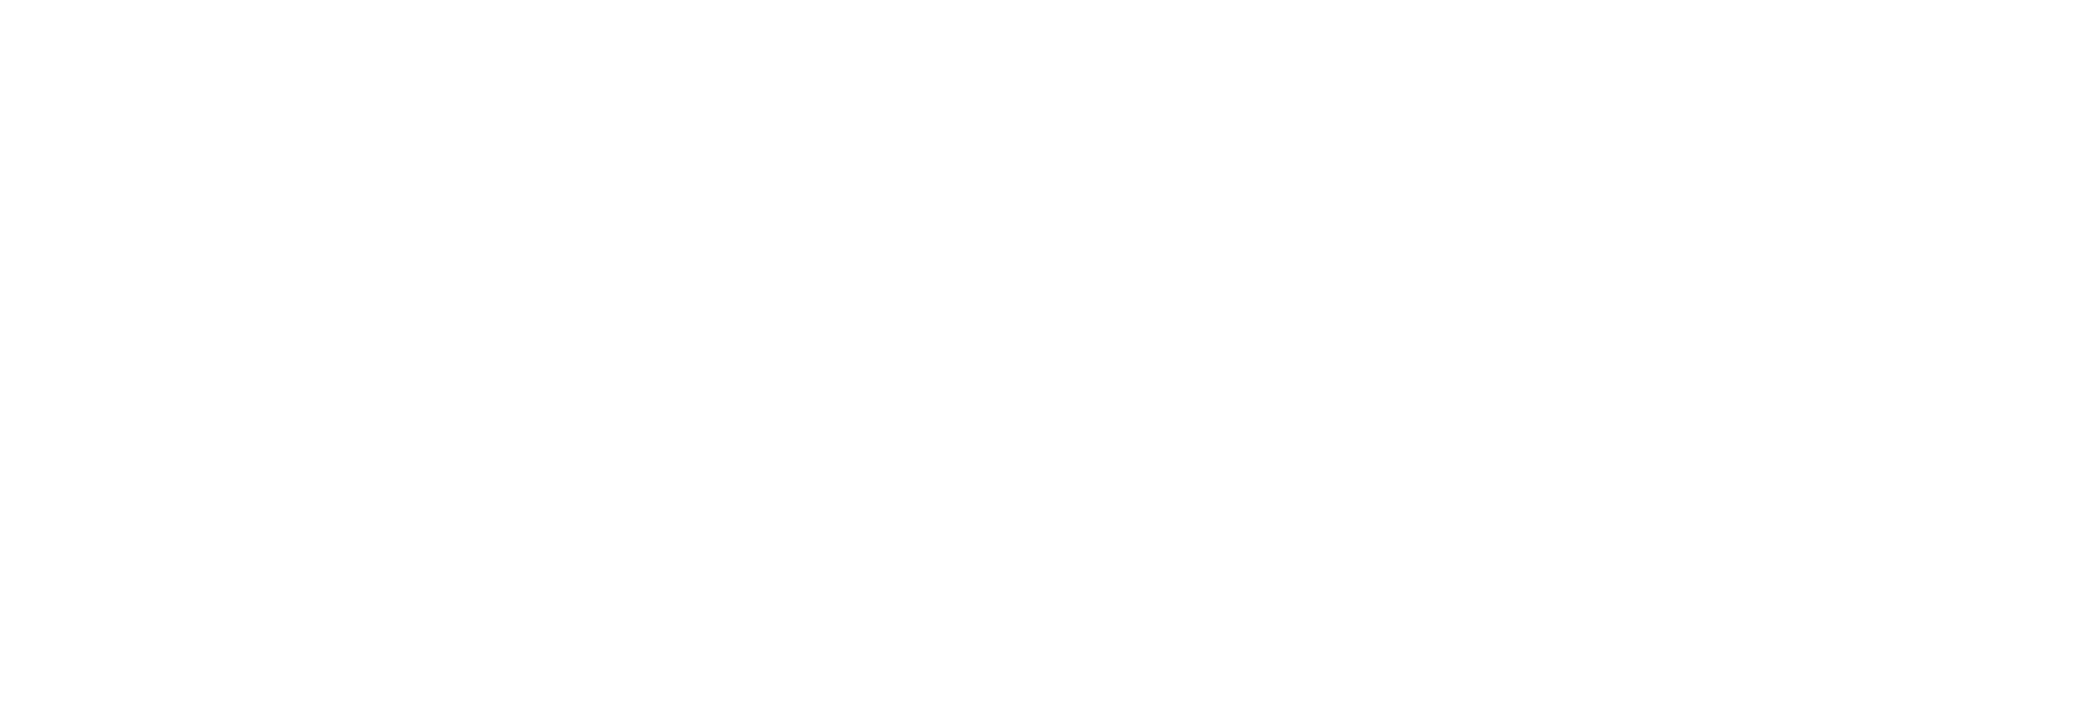 Marbodal-at